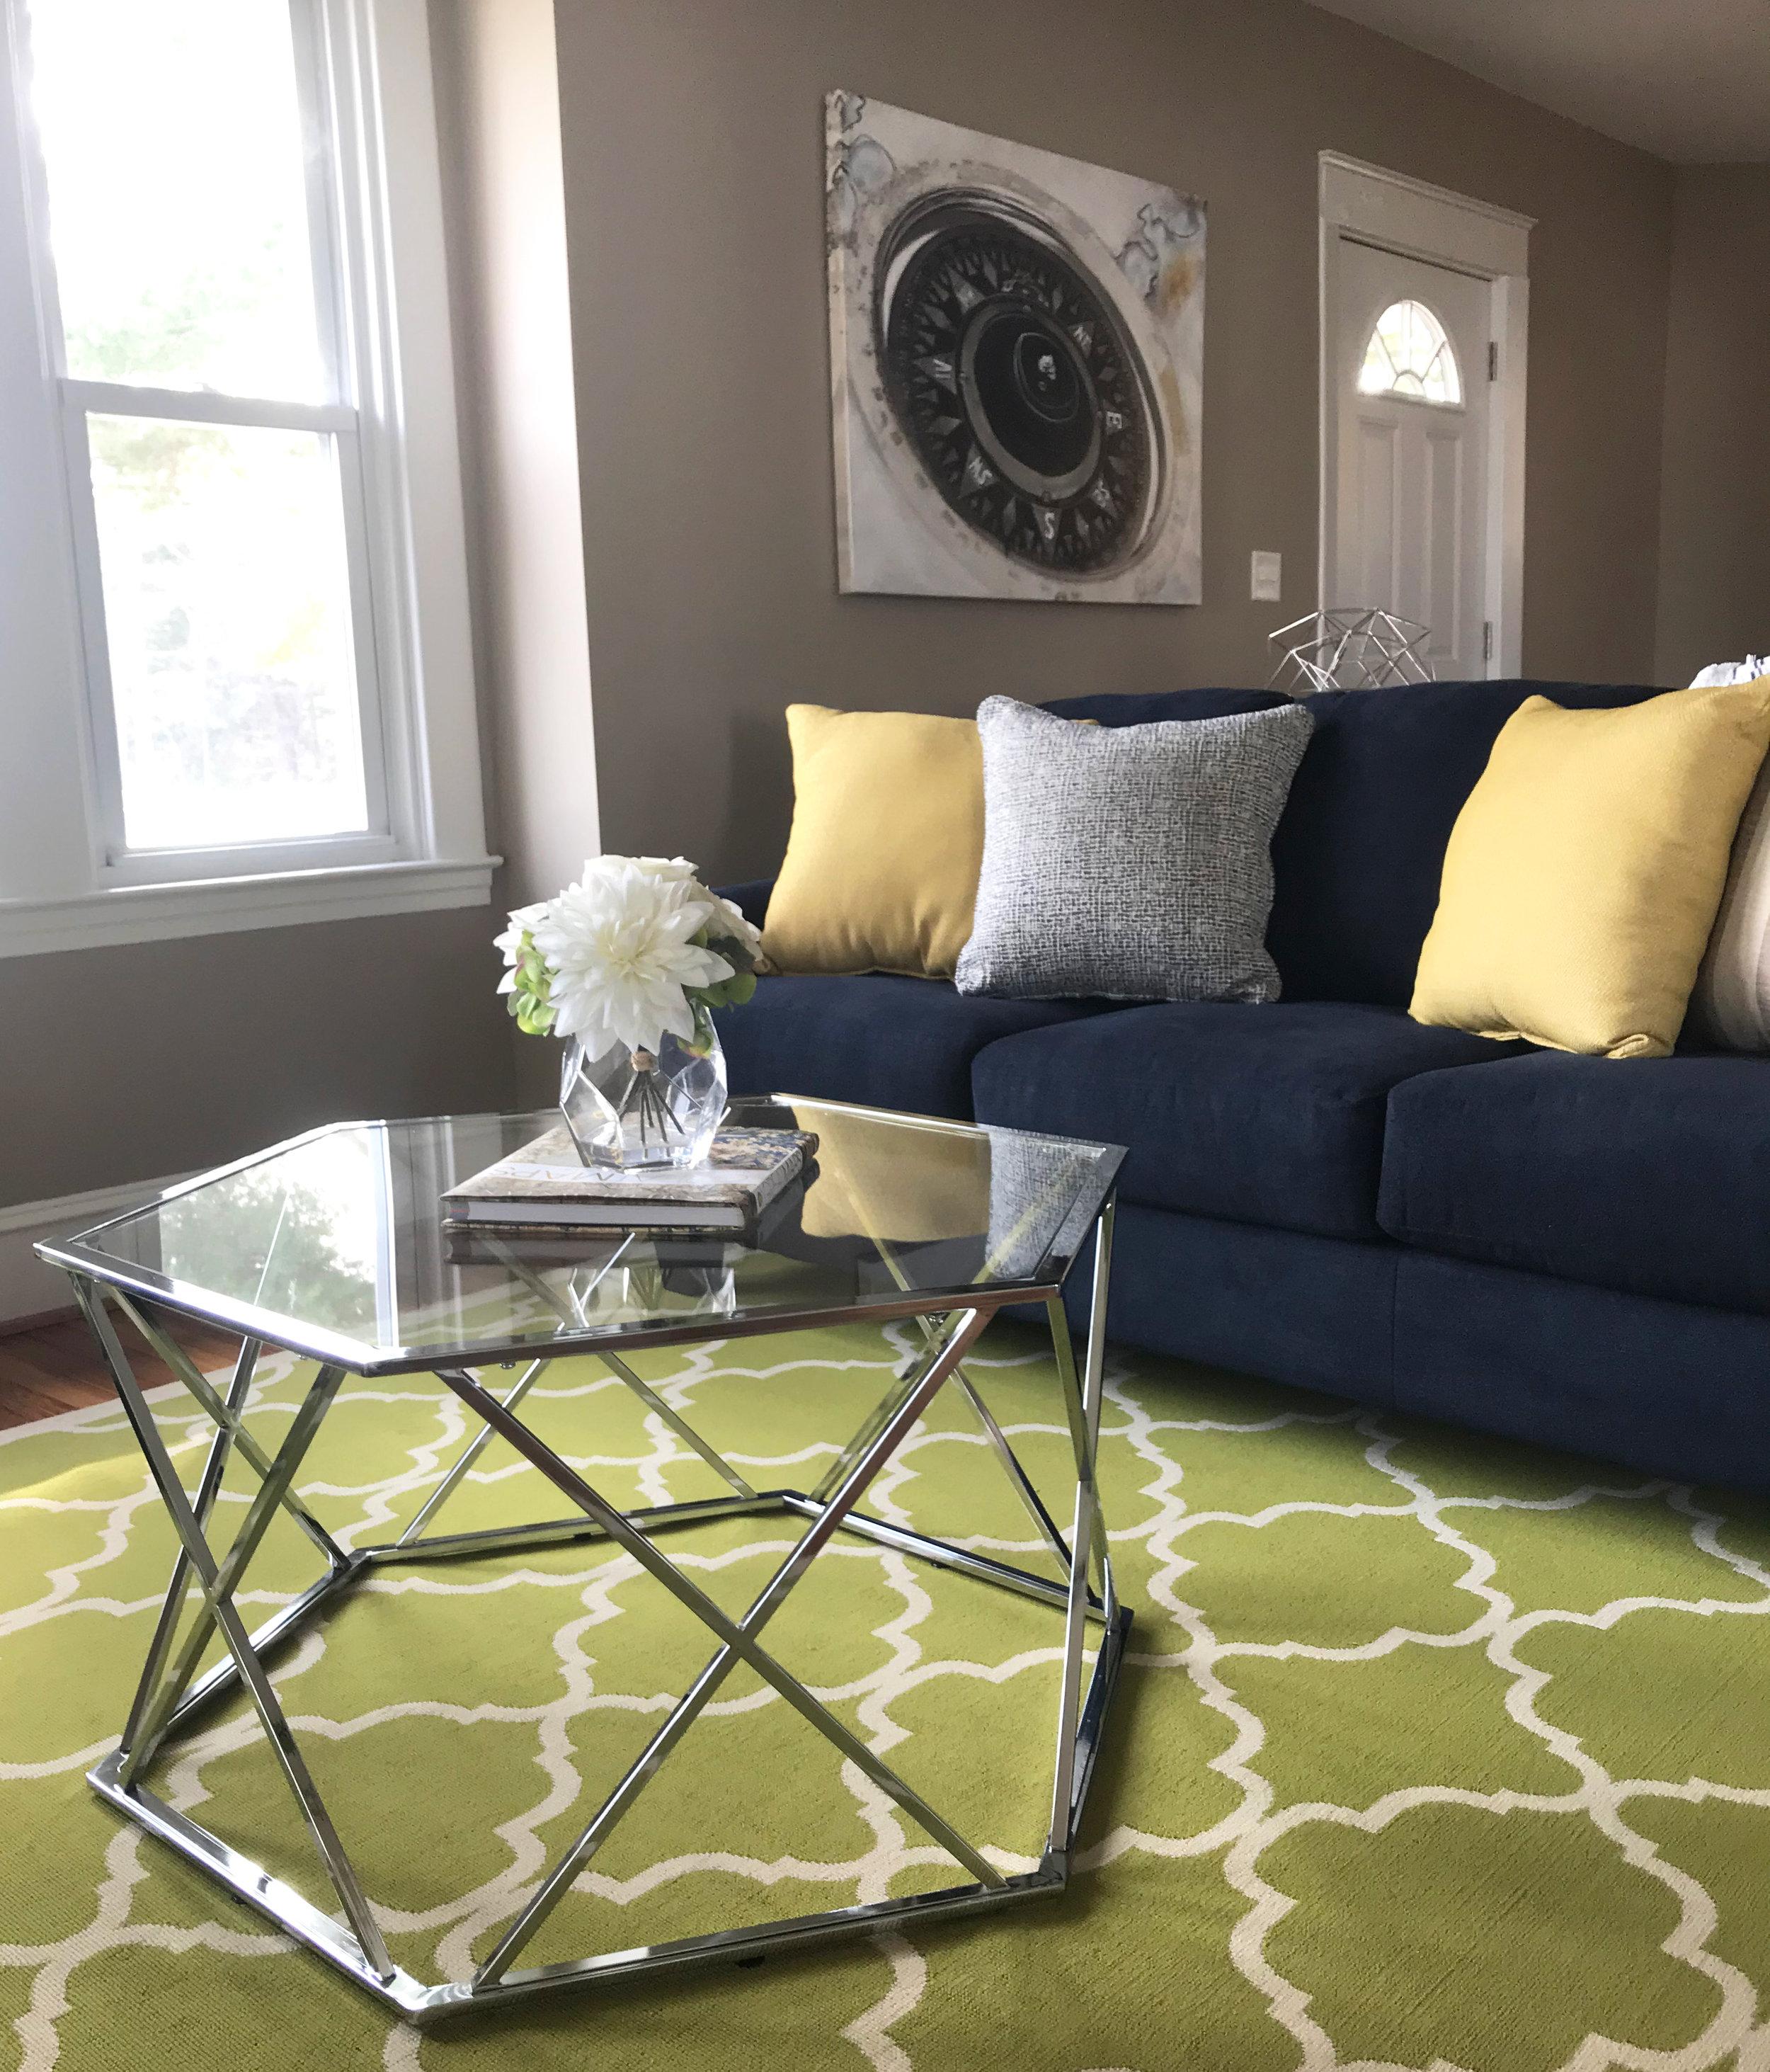 clover-oak-co-stagedtosell-linthicummd-livingroom2.jpg